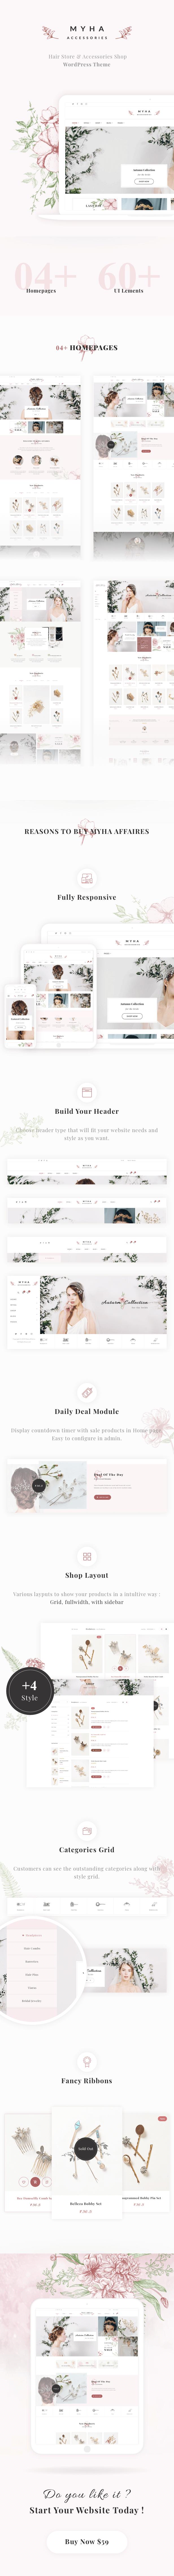 Myha - Accessories Store & Hair Shop WordPress theme 16